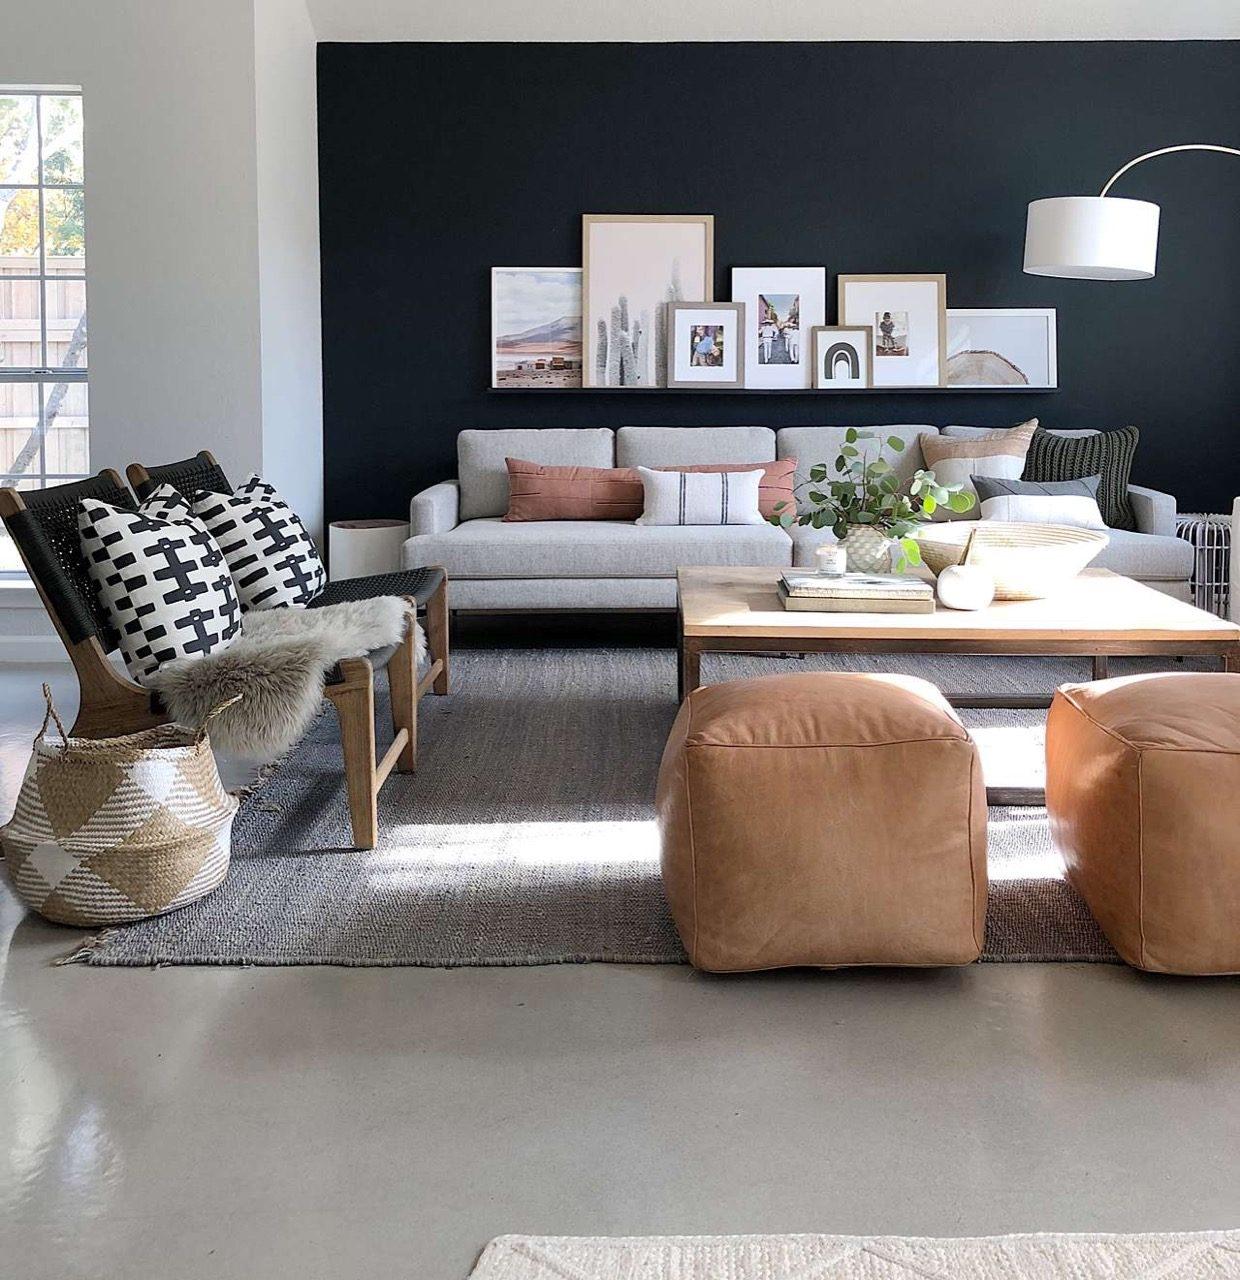 Living room decor for dark wall